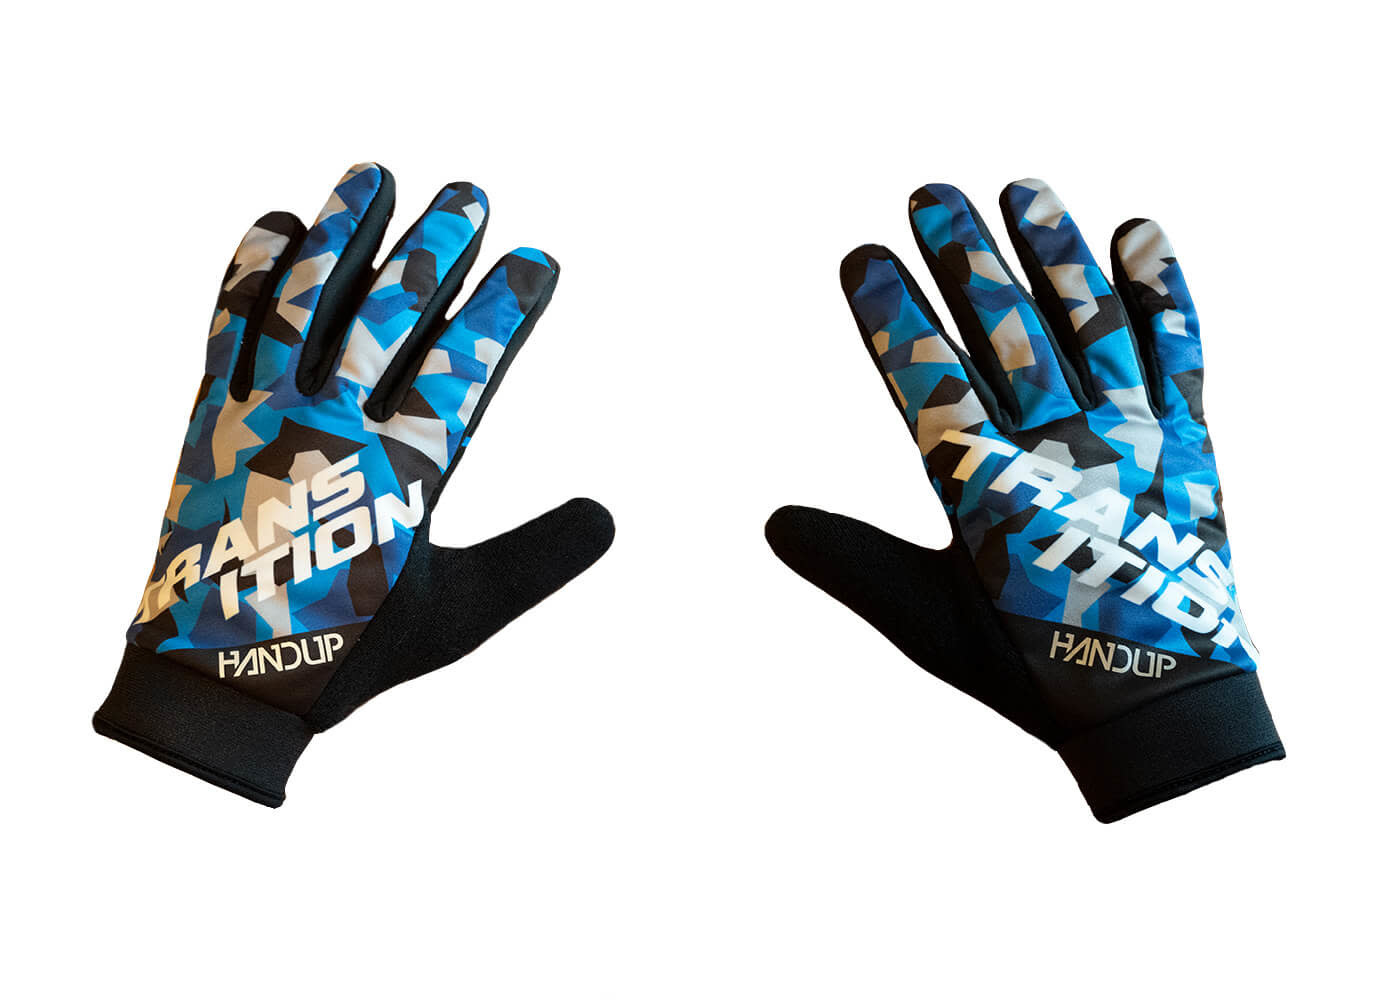 TBC - Digital Frost Glove (Large, Blue/Grey/Black)